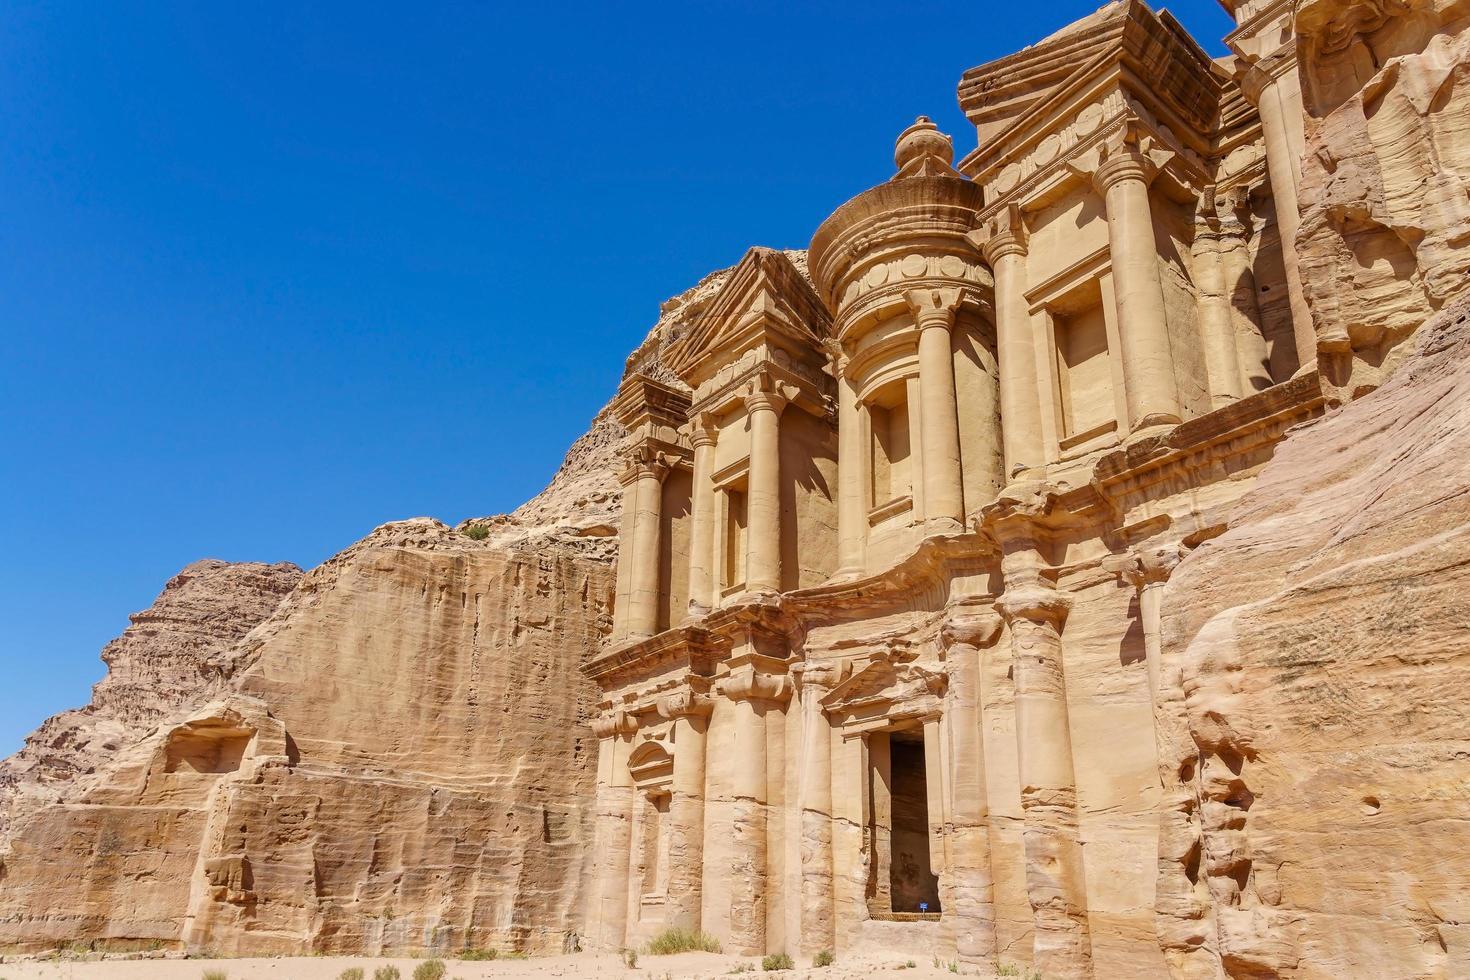 la facciata di ad deir a petra, giordania foto